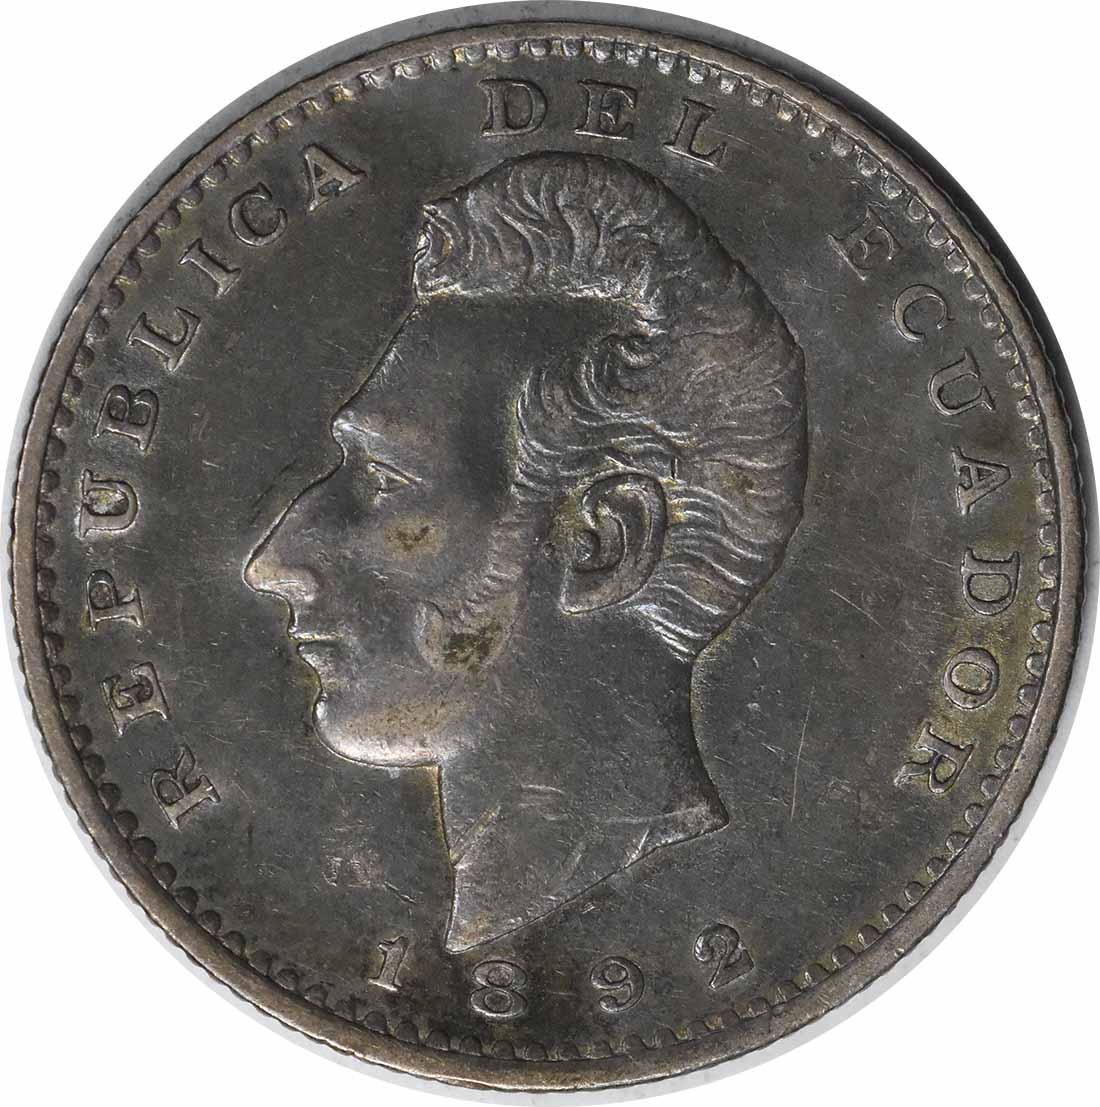 1892 TF Ecuador 2 Decimos KM51.3 AU Uncertified